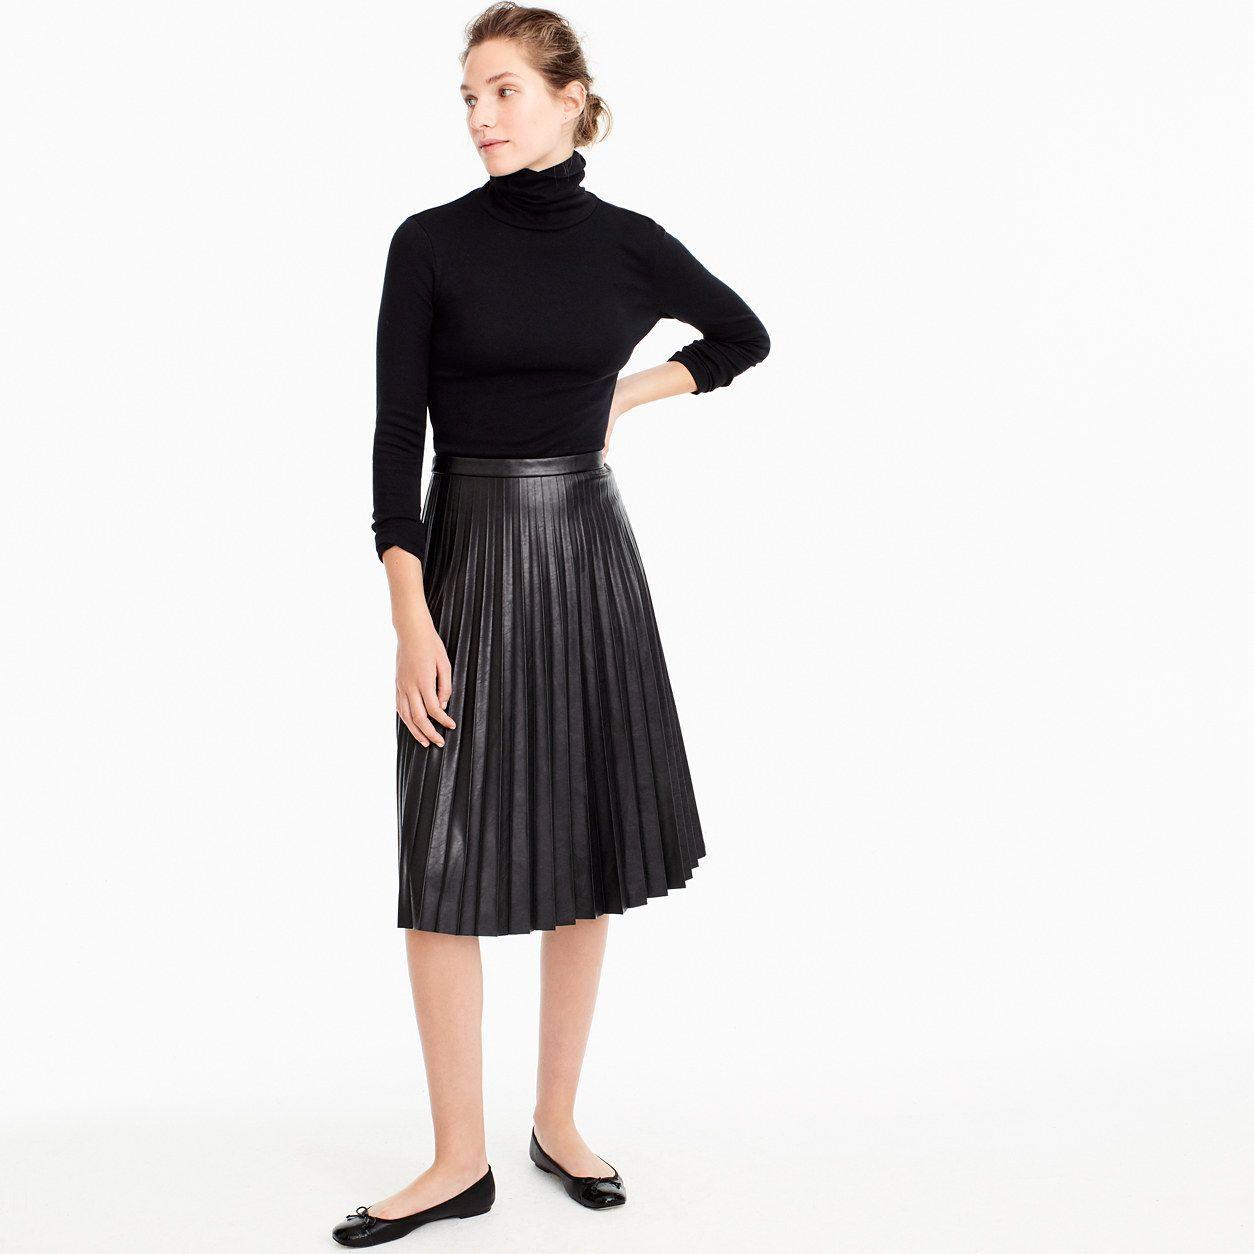 dac694bf2e J.Crew Womens Petite Faux-Leather Pleated Midi Skirt | Women's ...